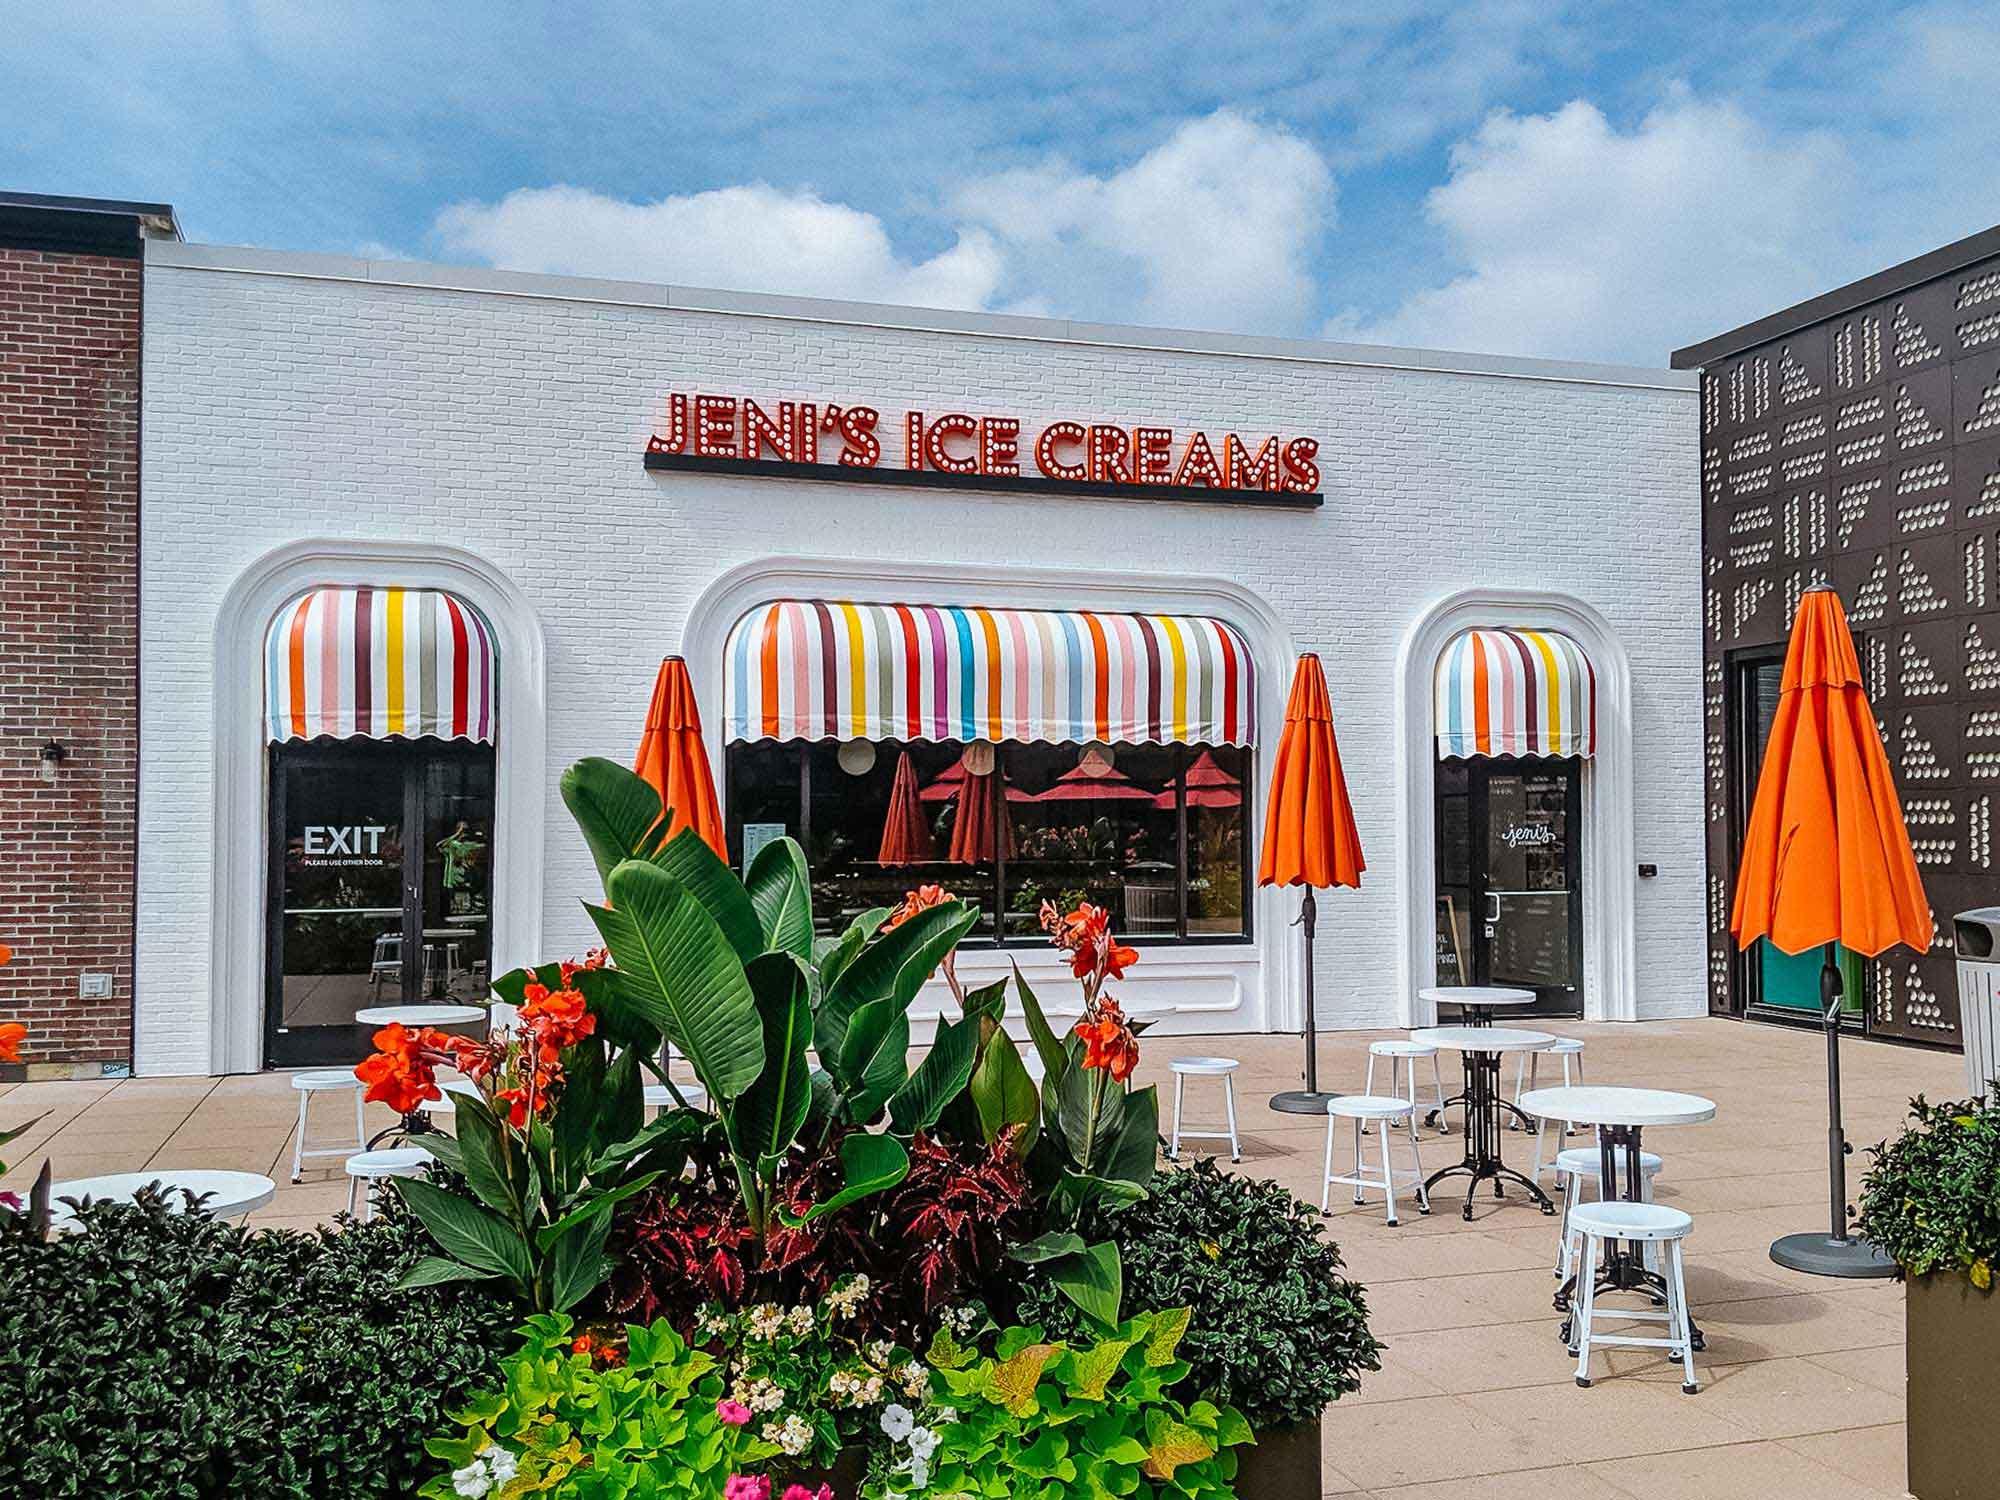 Exterior of Jeni's Ice Creams